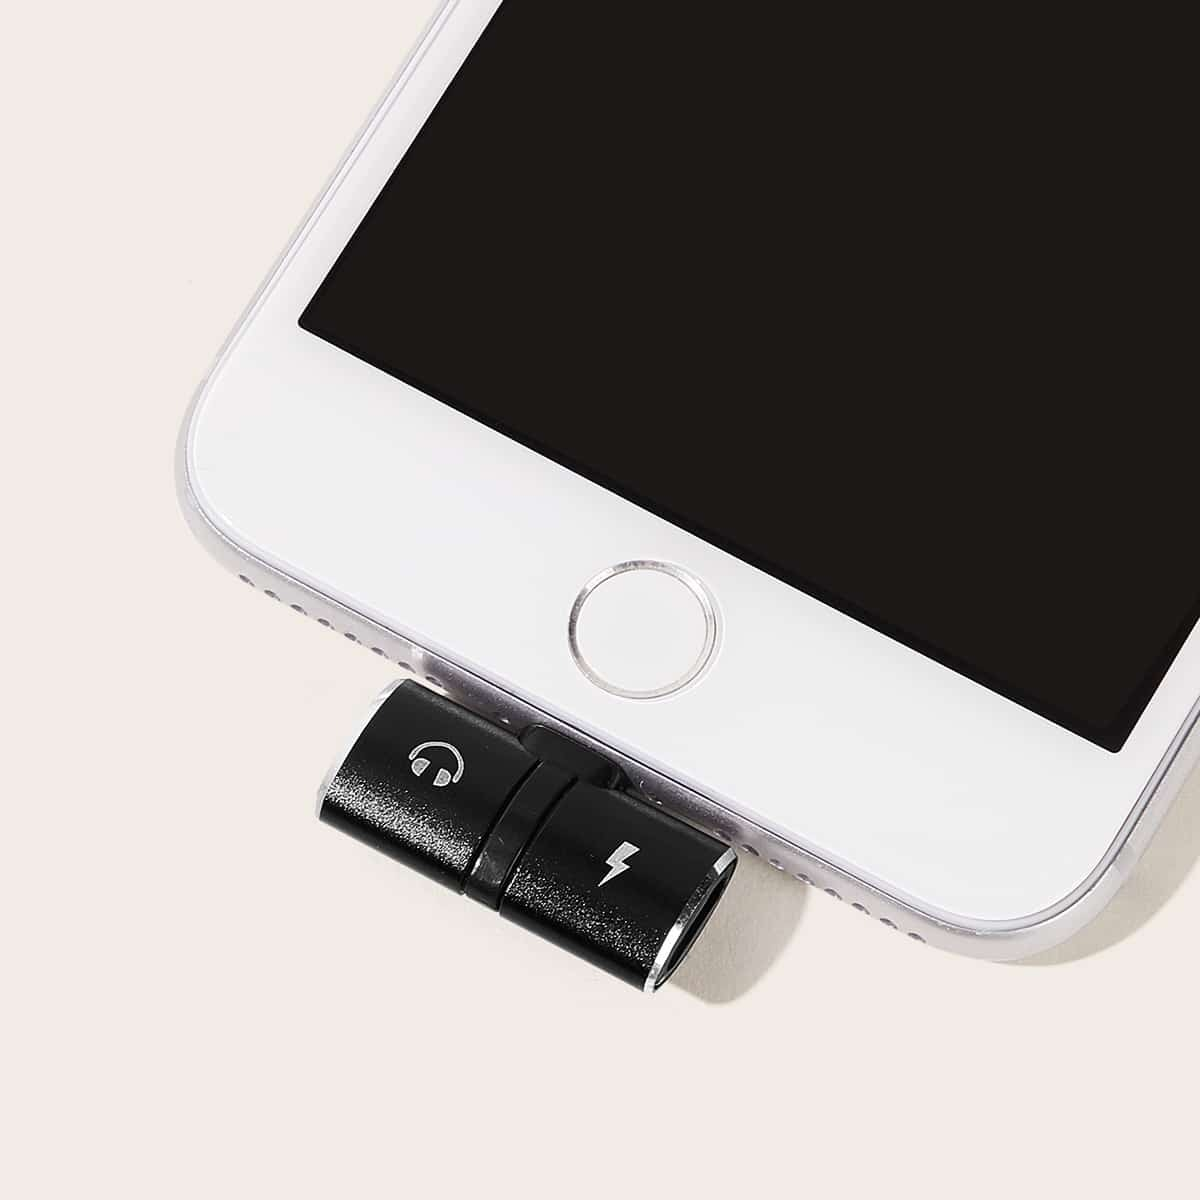 iPhone 2 in 1 USB-converter